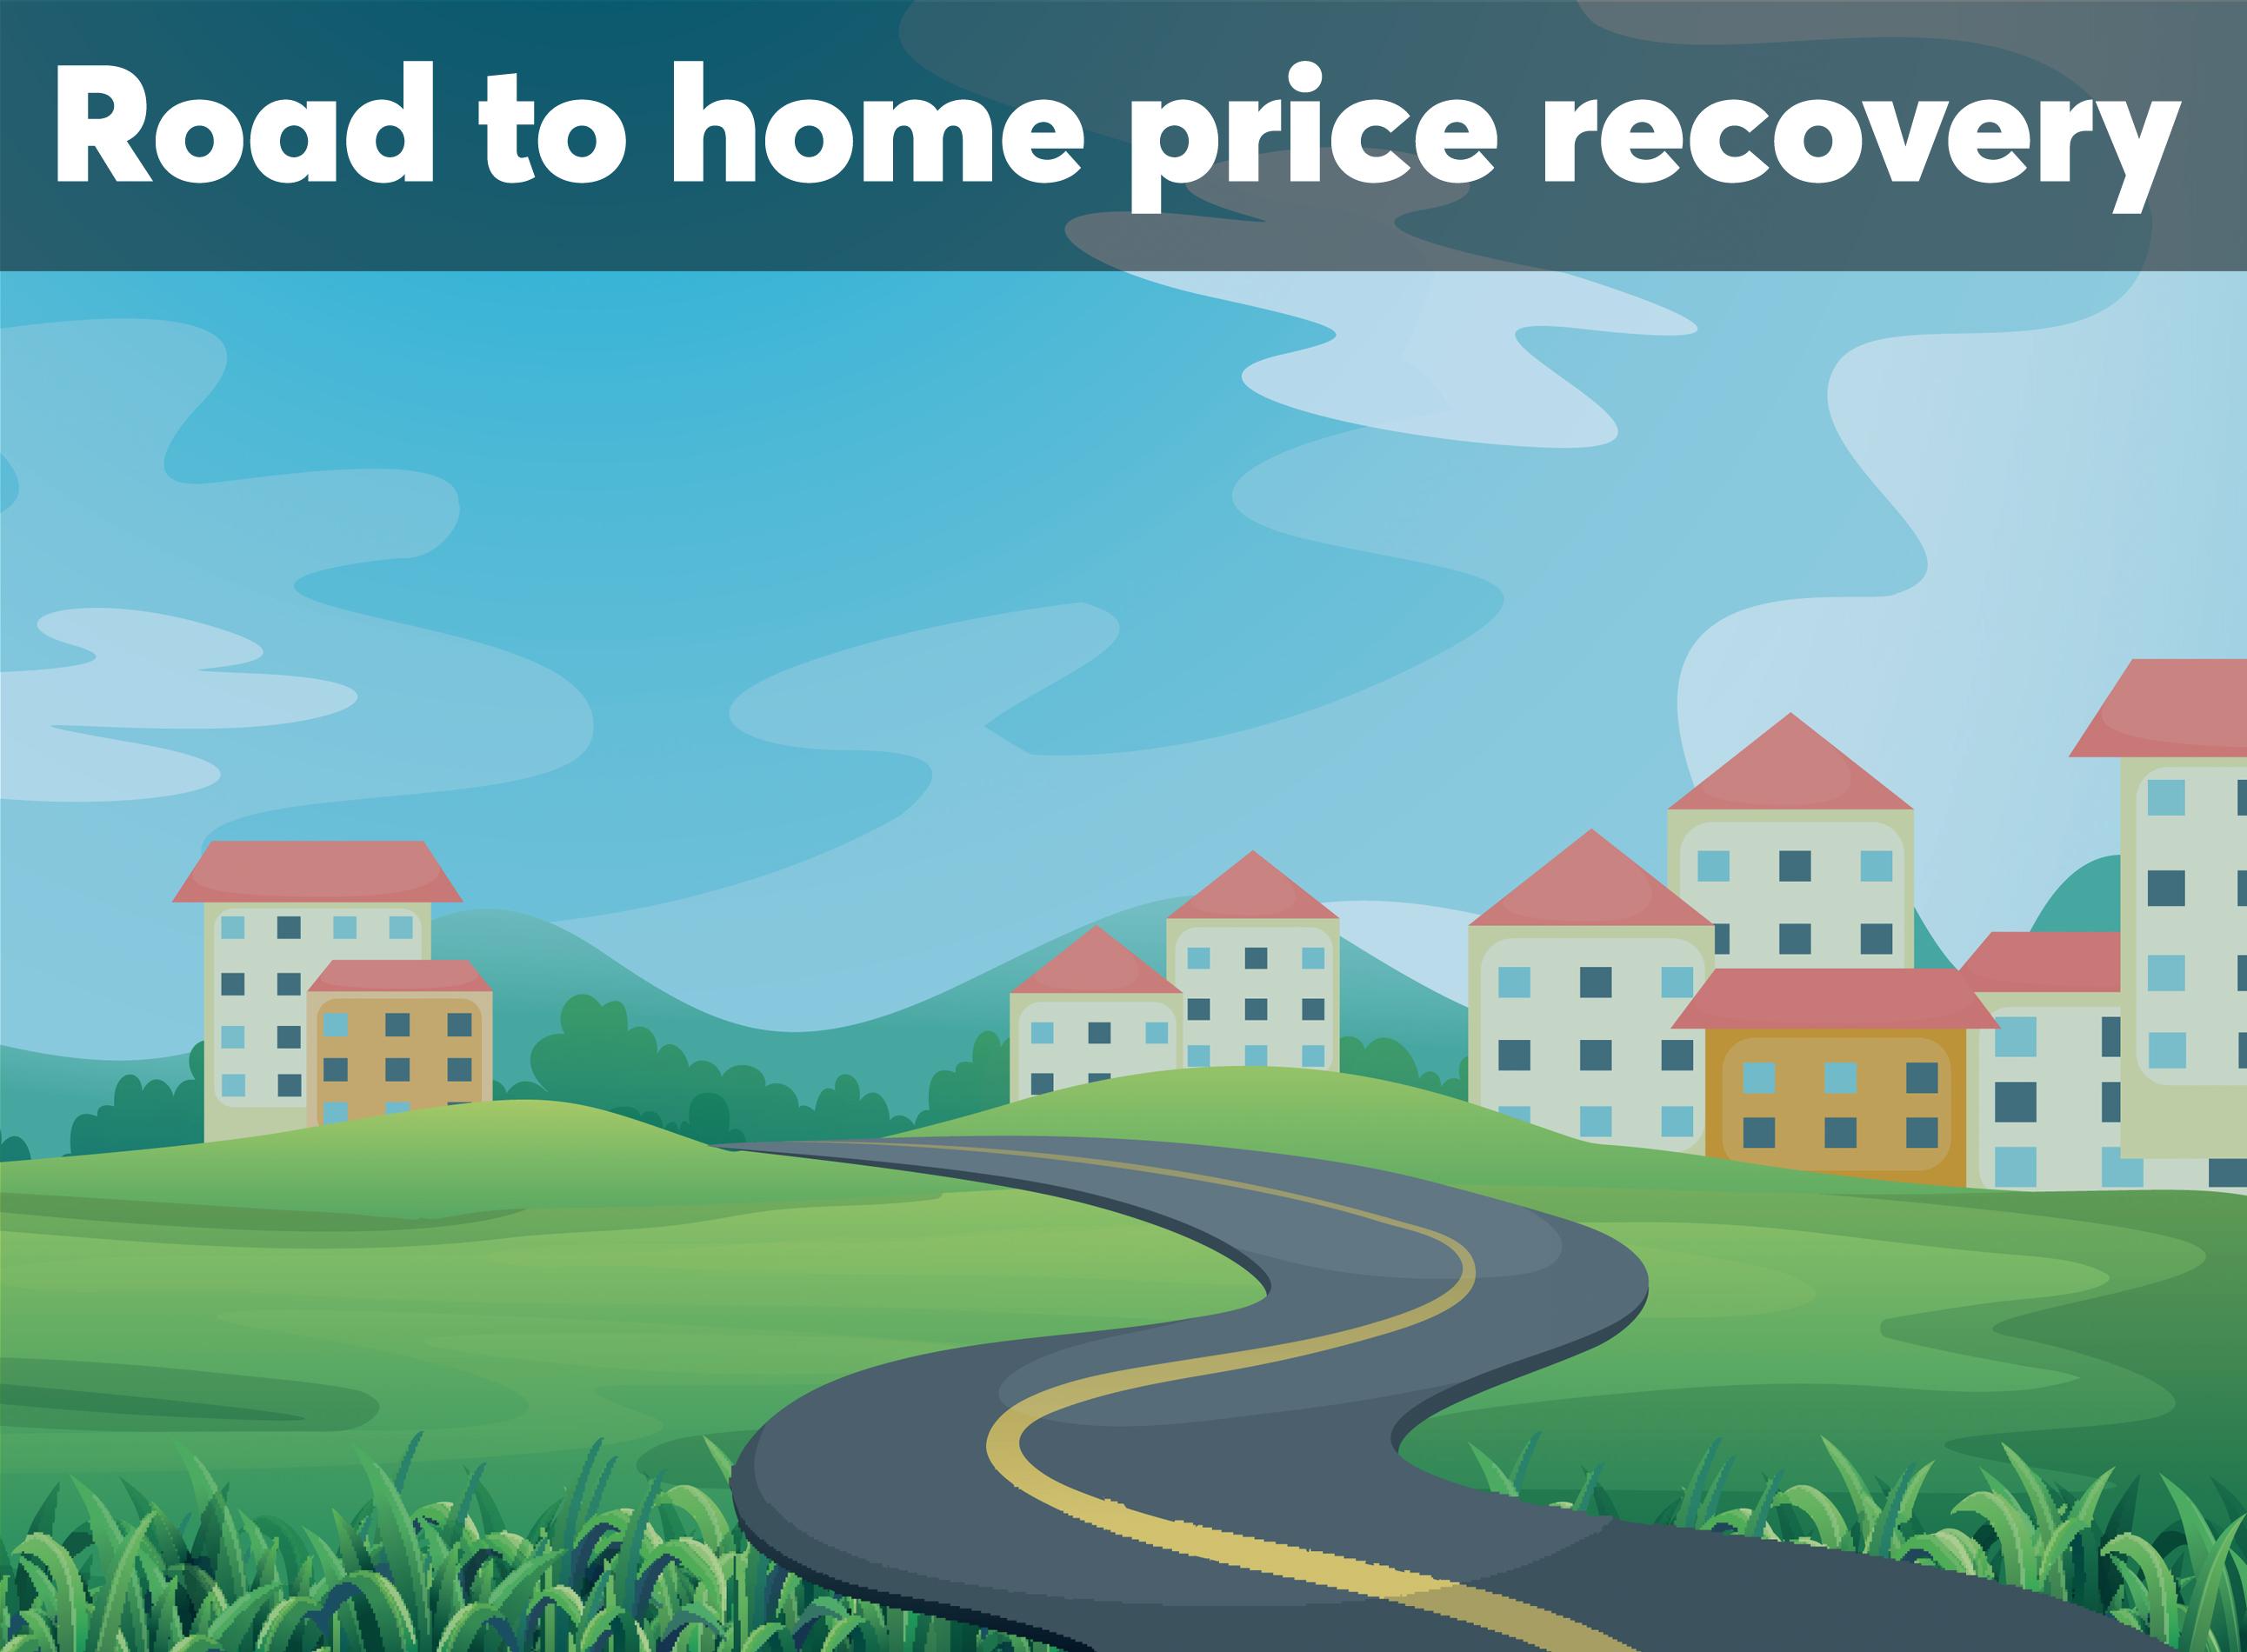 https://assets.sourcemedia.com/55/e3/81d2b3b04d8ba18995a2b52bcc5e/homeprice-recovery-slideshow.jpg